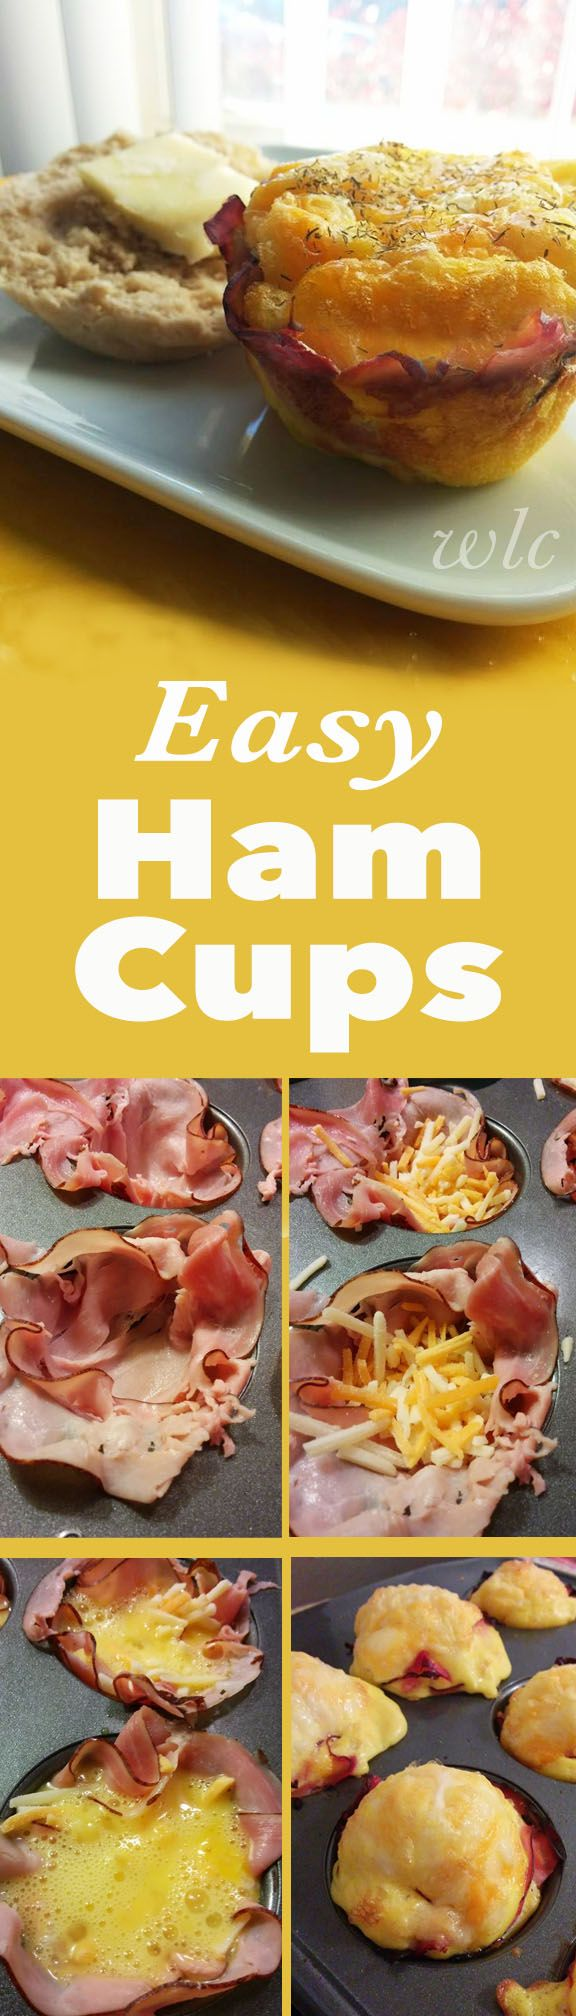 Perfect Saturday Morning Breakfast. #ham #eggs #cheese